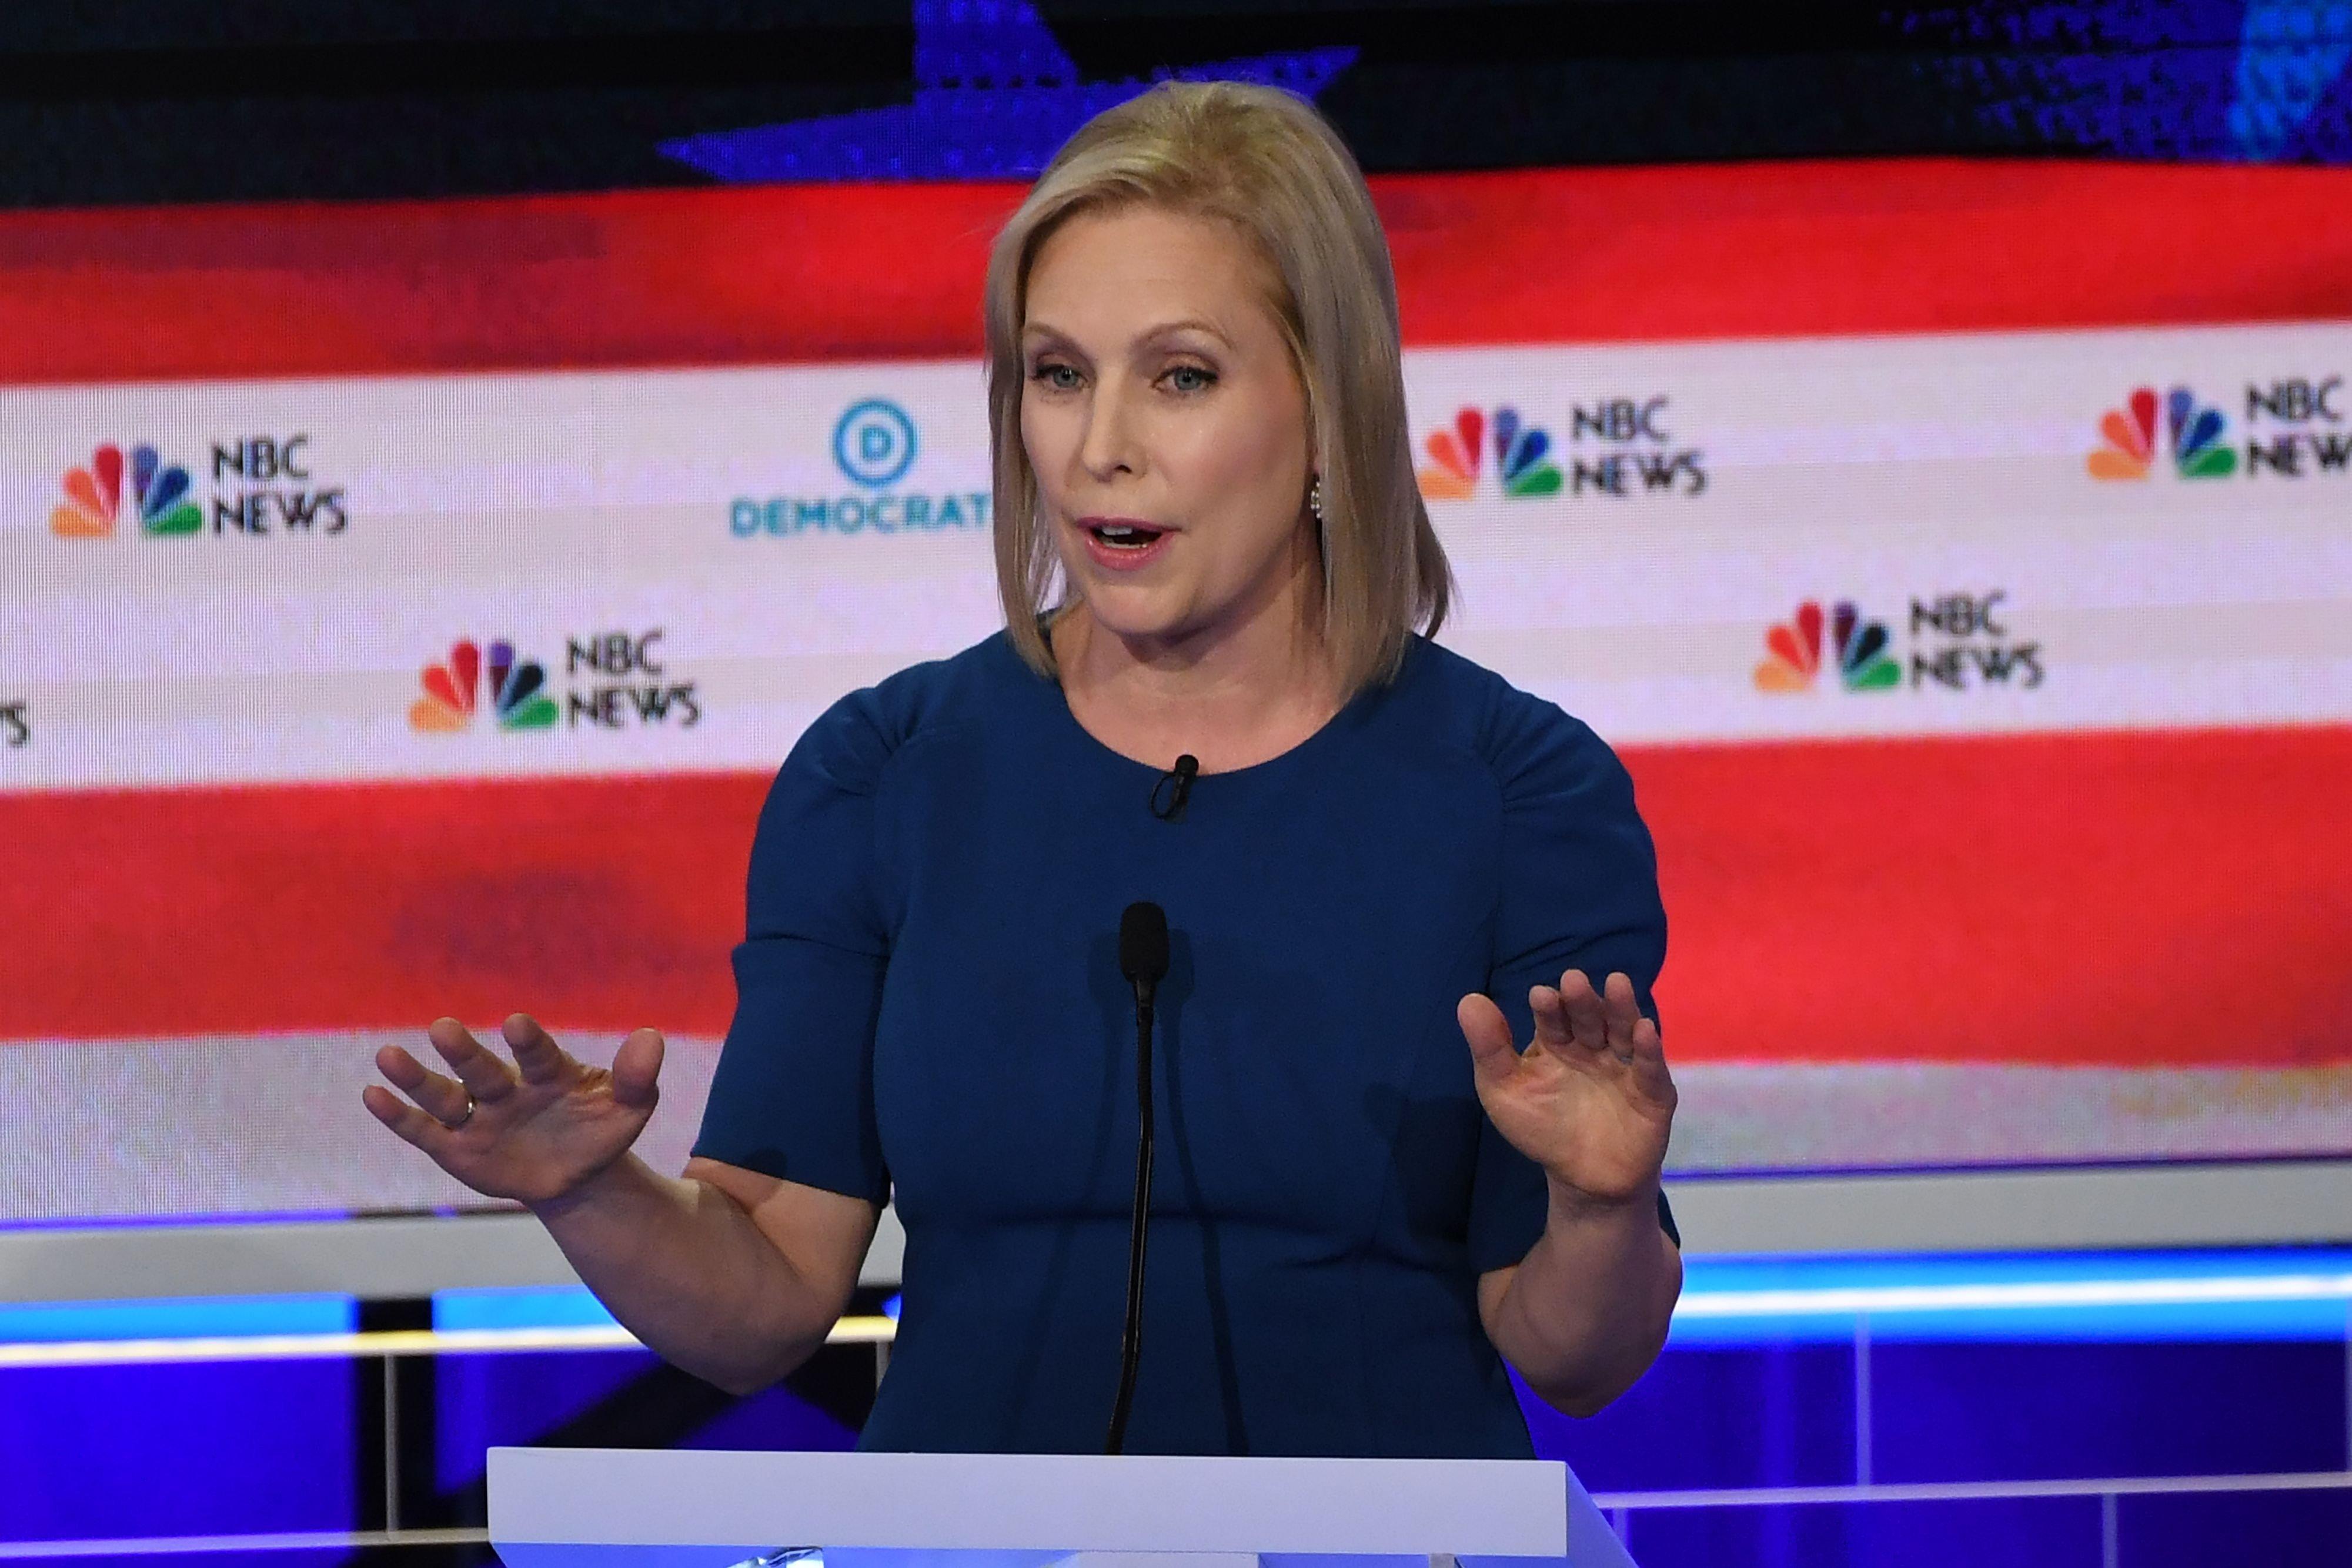 Kirsten Gillibrand says she does not regret calling for Al Franken's resignation